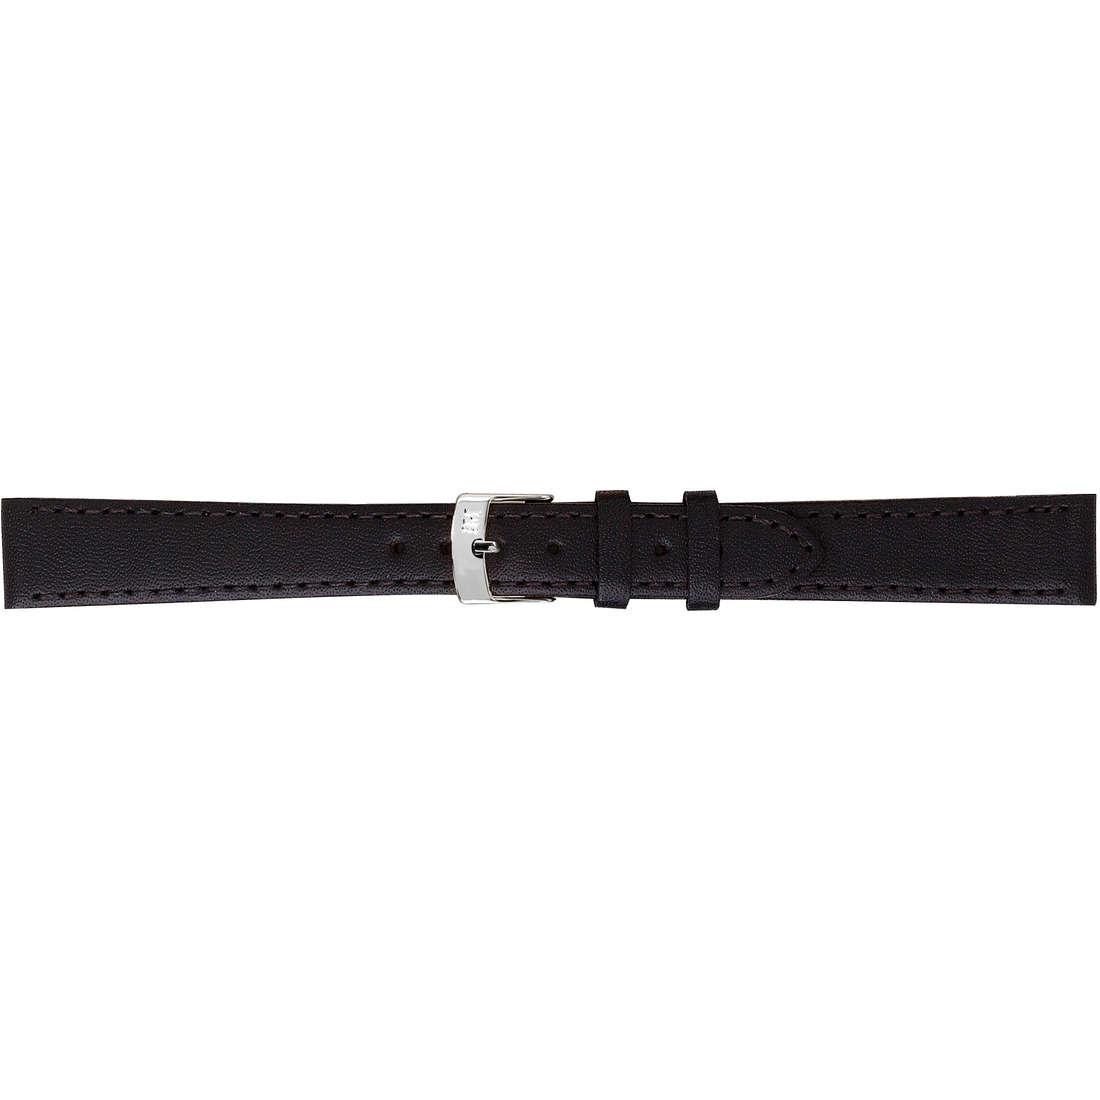 watch watch bands watch straps man Morellato Performance A01X2619875019CR16